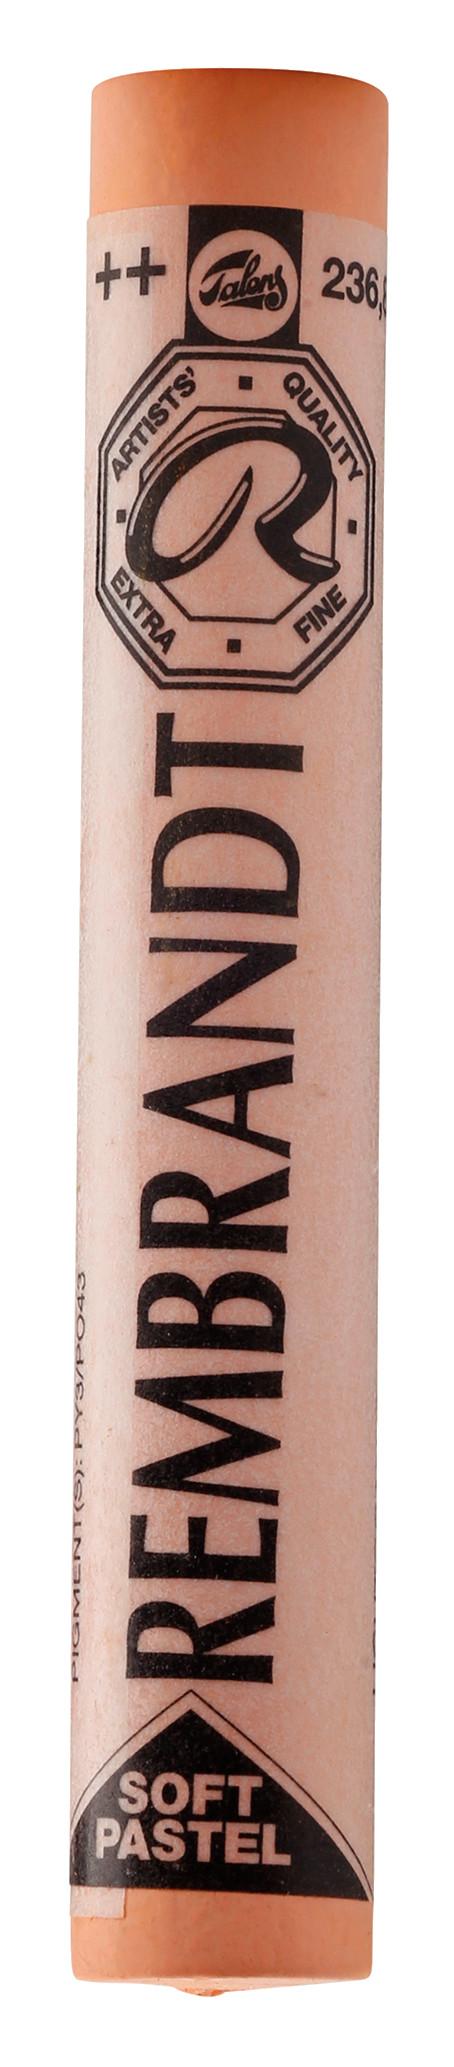 Rembrandt Soft Pastel Round Full Stick Light Orange(8) (236.8)